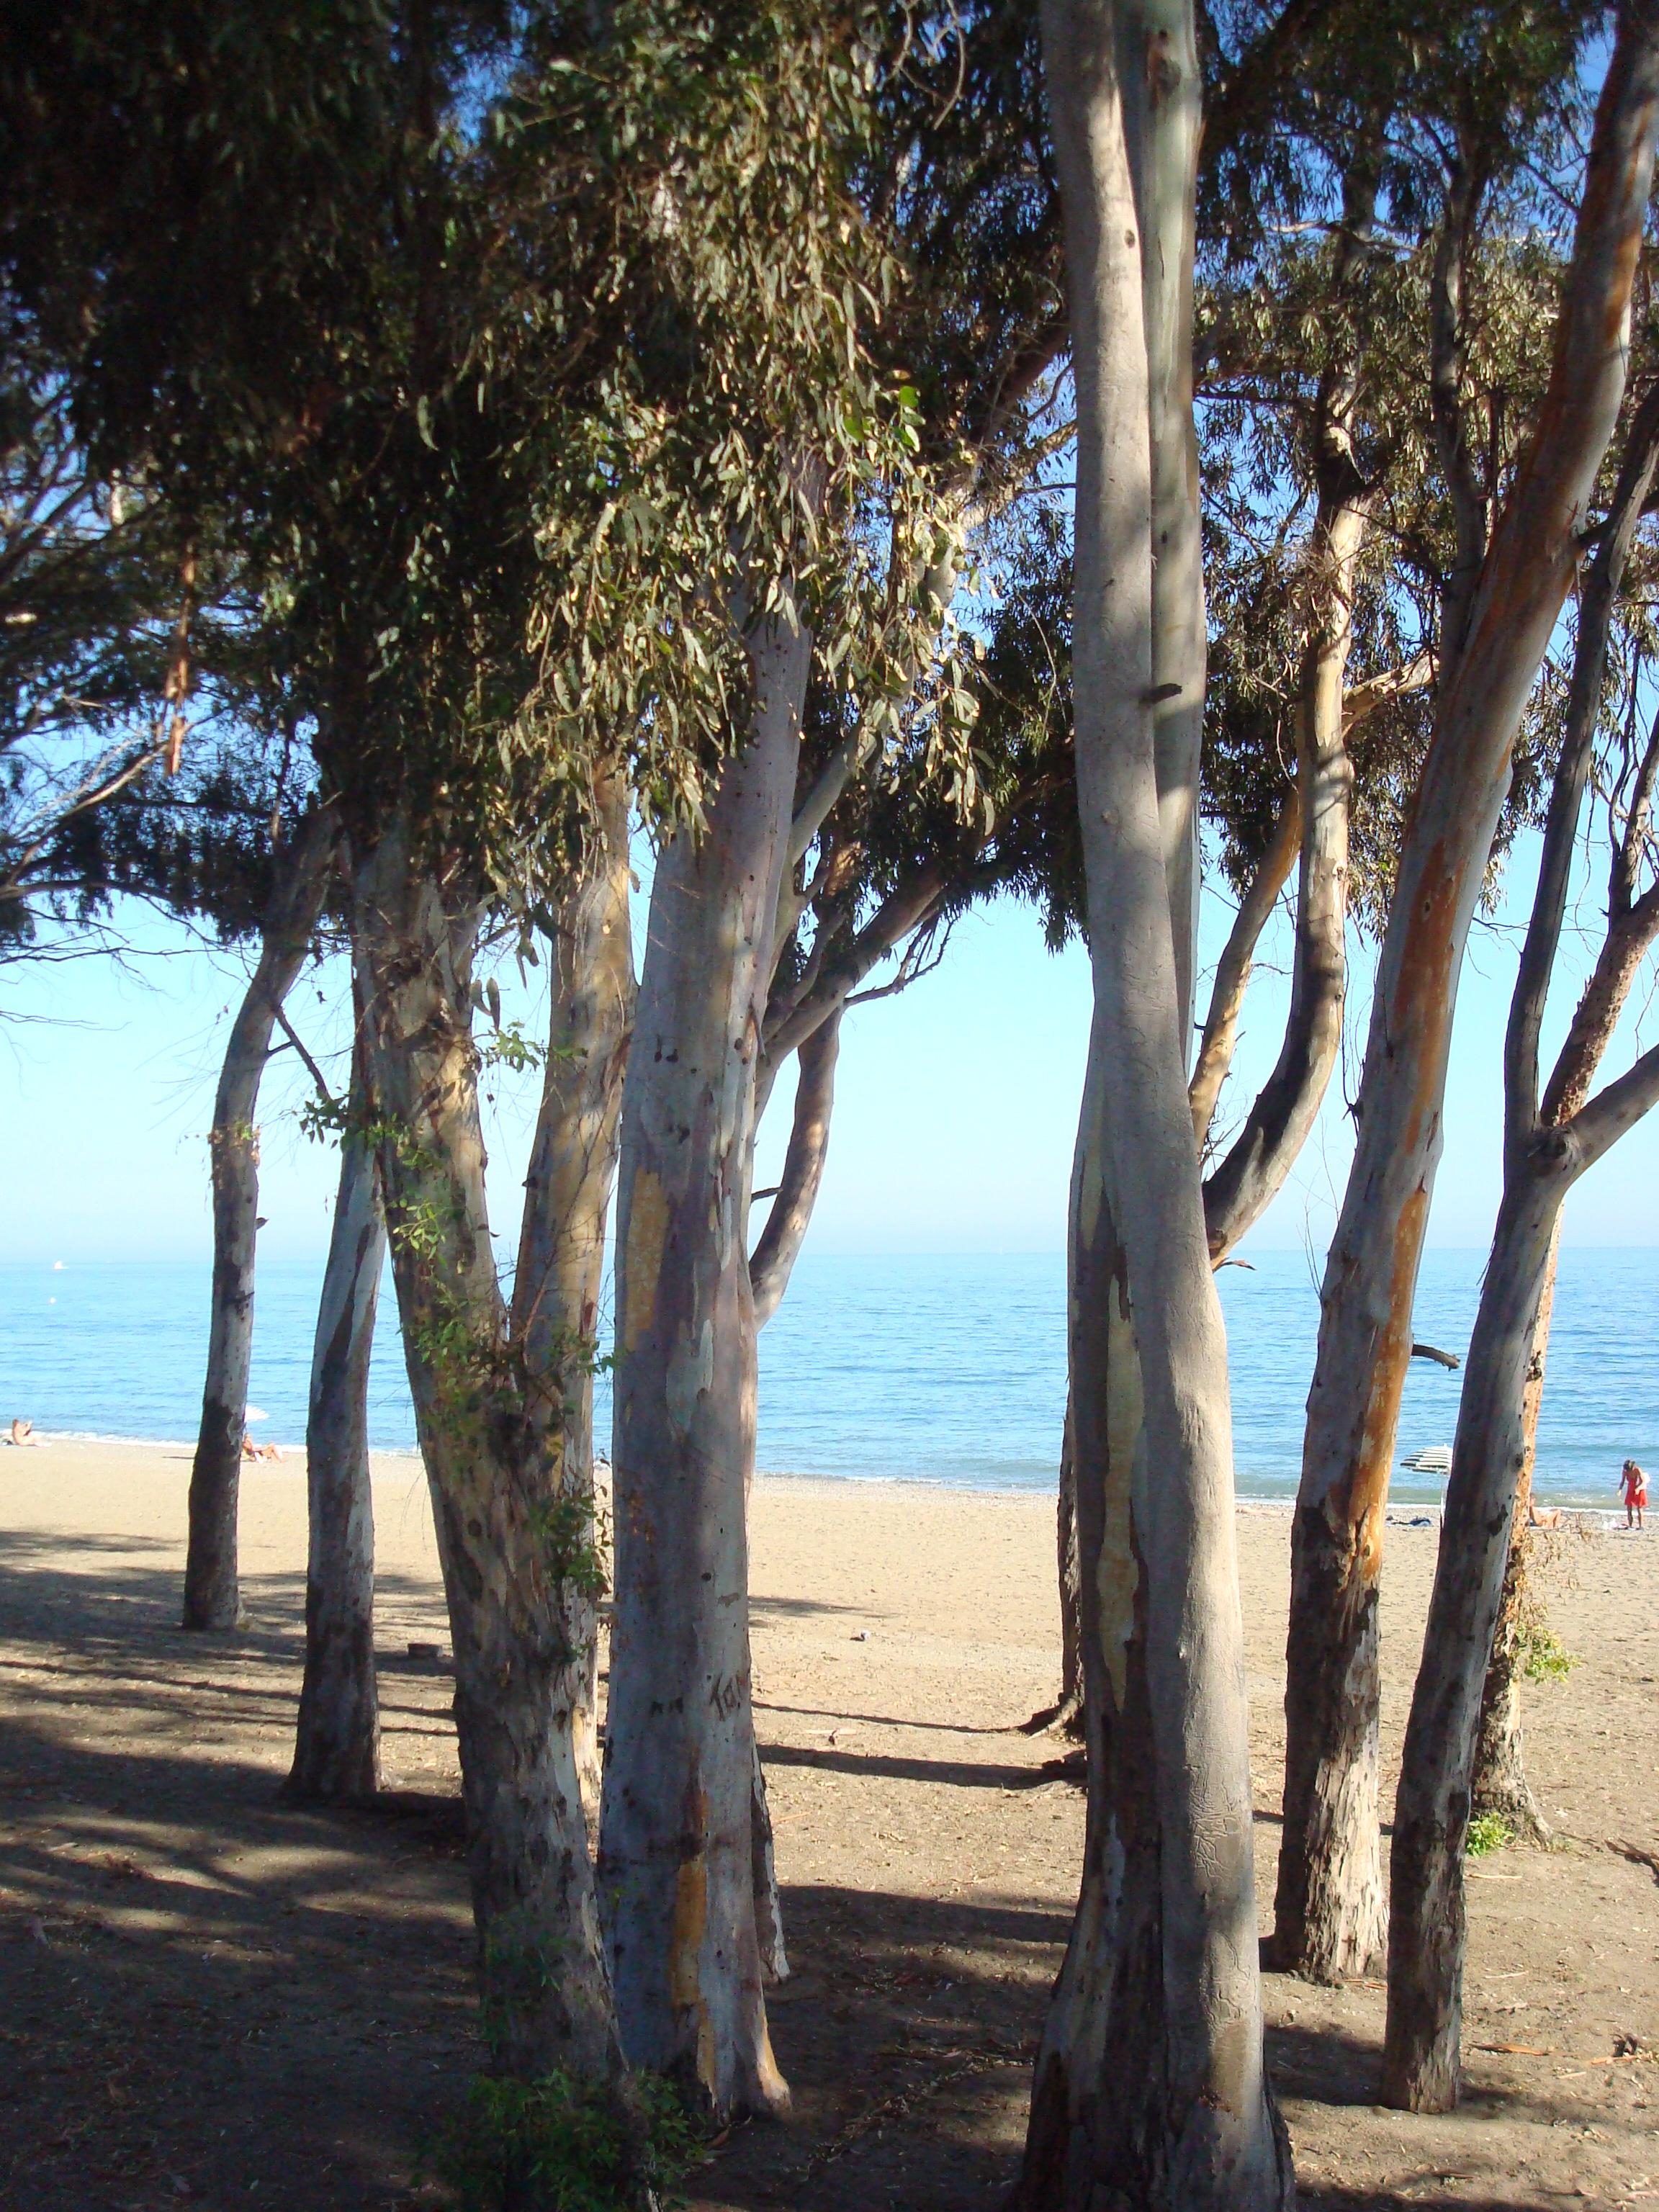 San pedro beach, malaga province andrew forbes (1)